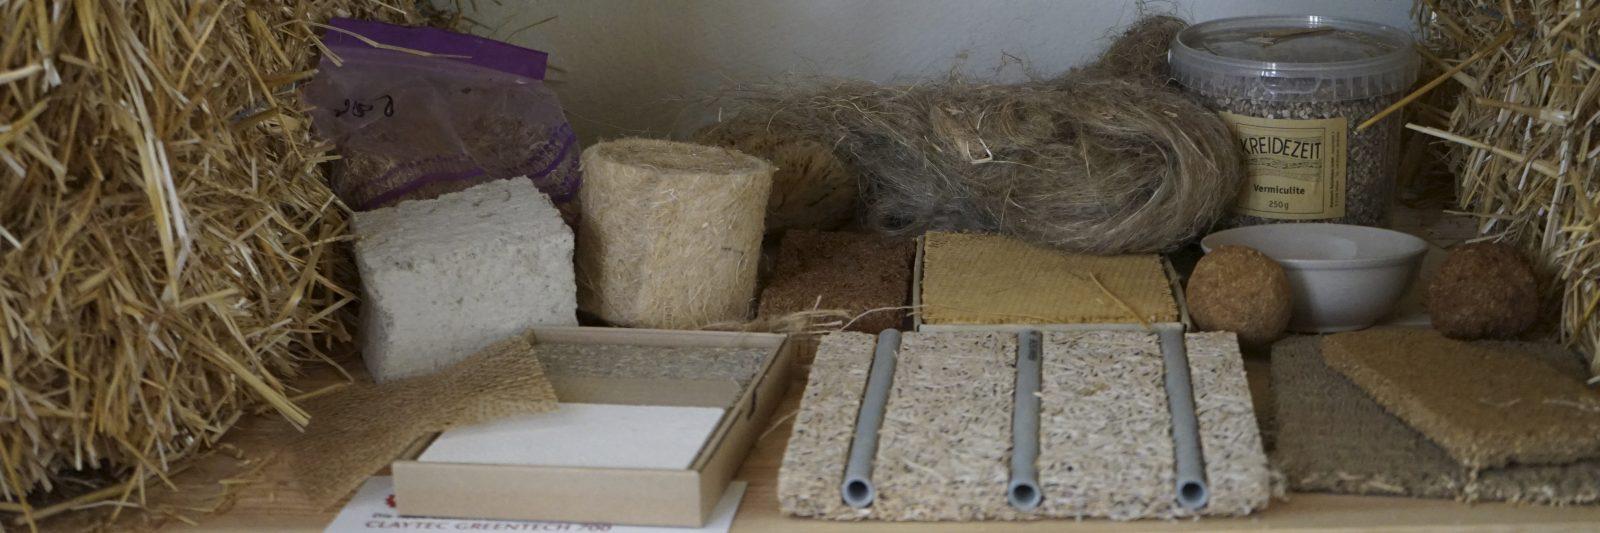 Lehmbau_Materialien